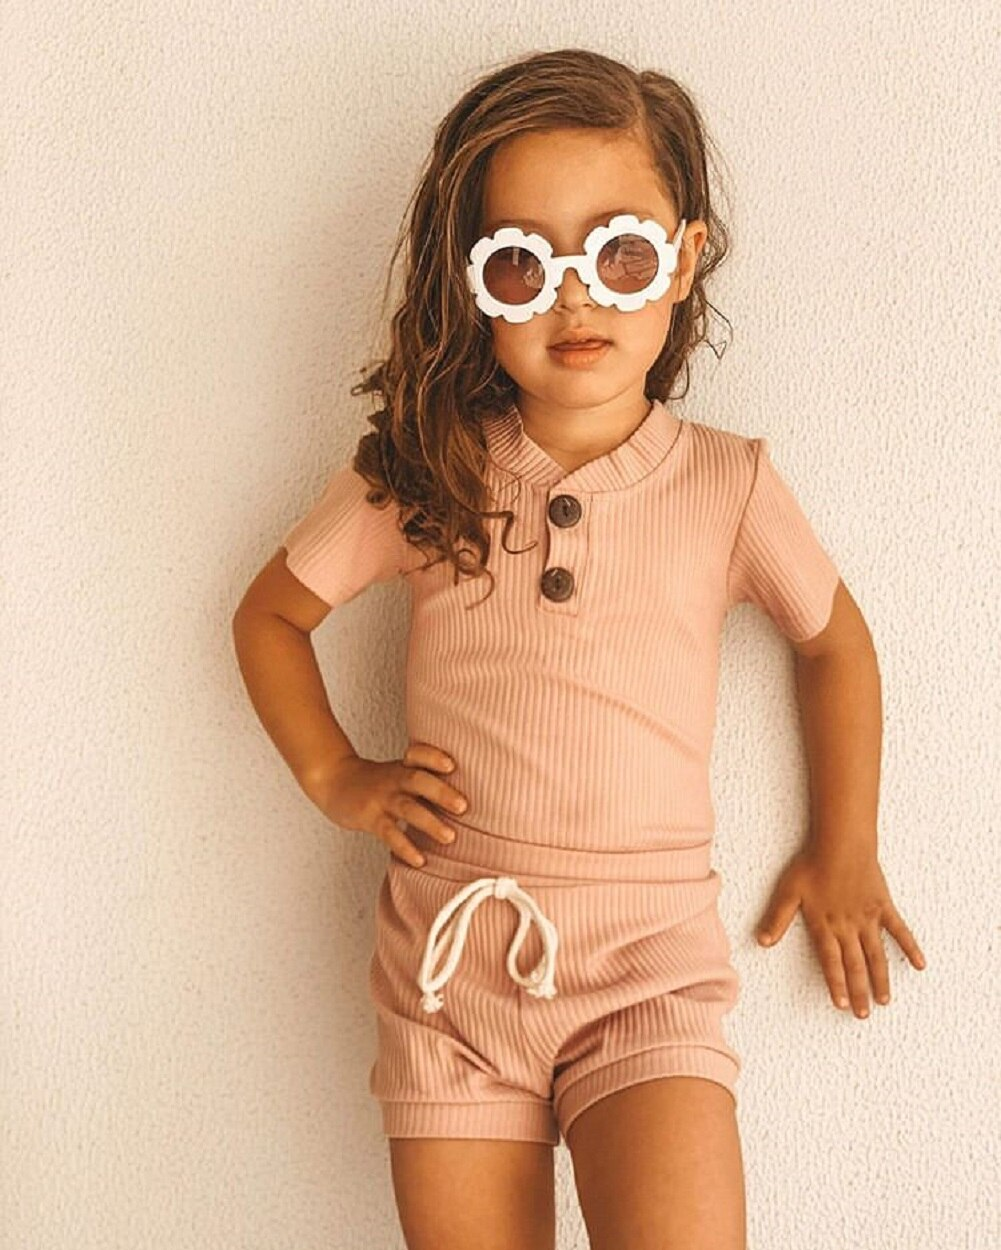 Newborn Kid Baby Boy Girl Clothes Short Sleeve Romper Bodysuit For Newborn Outfits 2020 Summer Baby Boys Girls Set